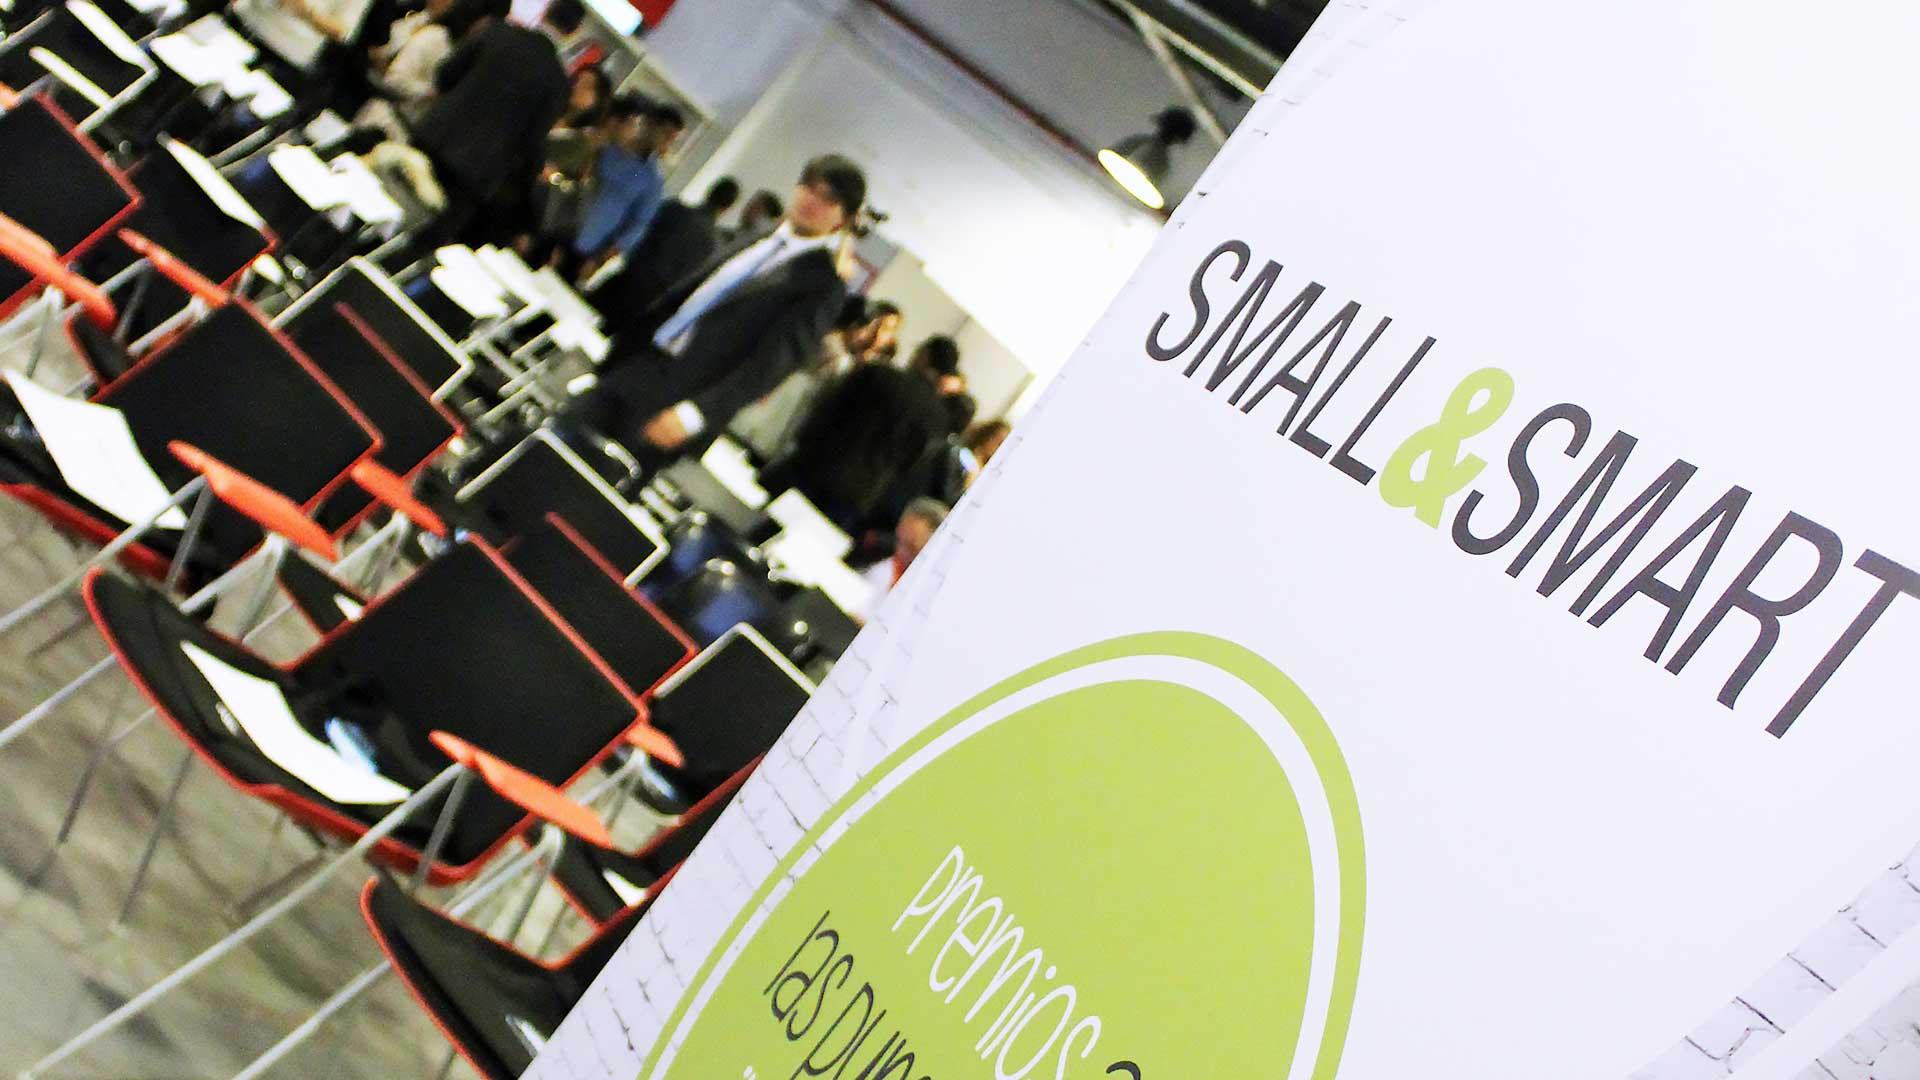 smallsmart-premios-startups-pymes-2015-cartel